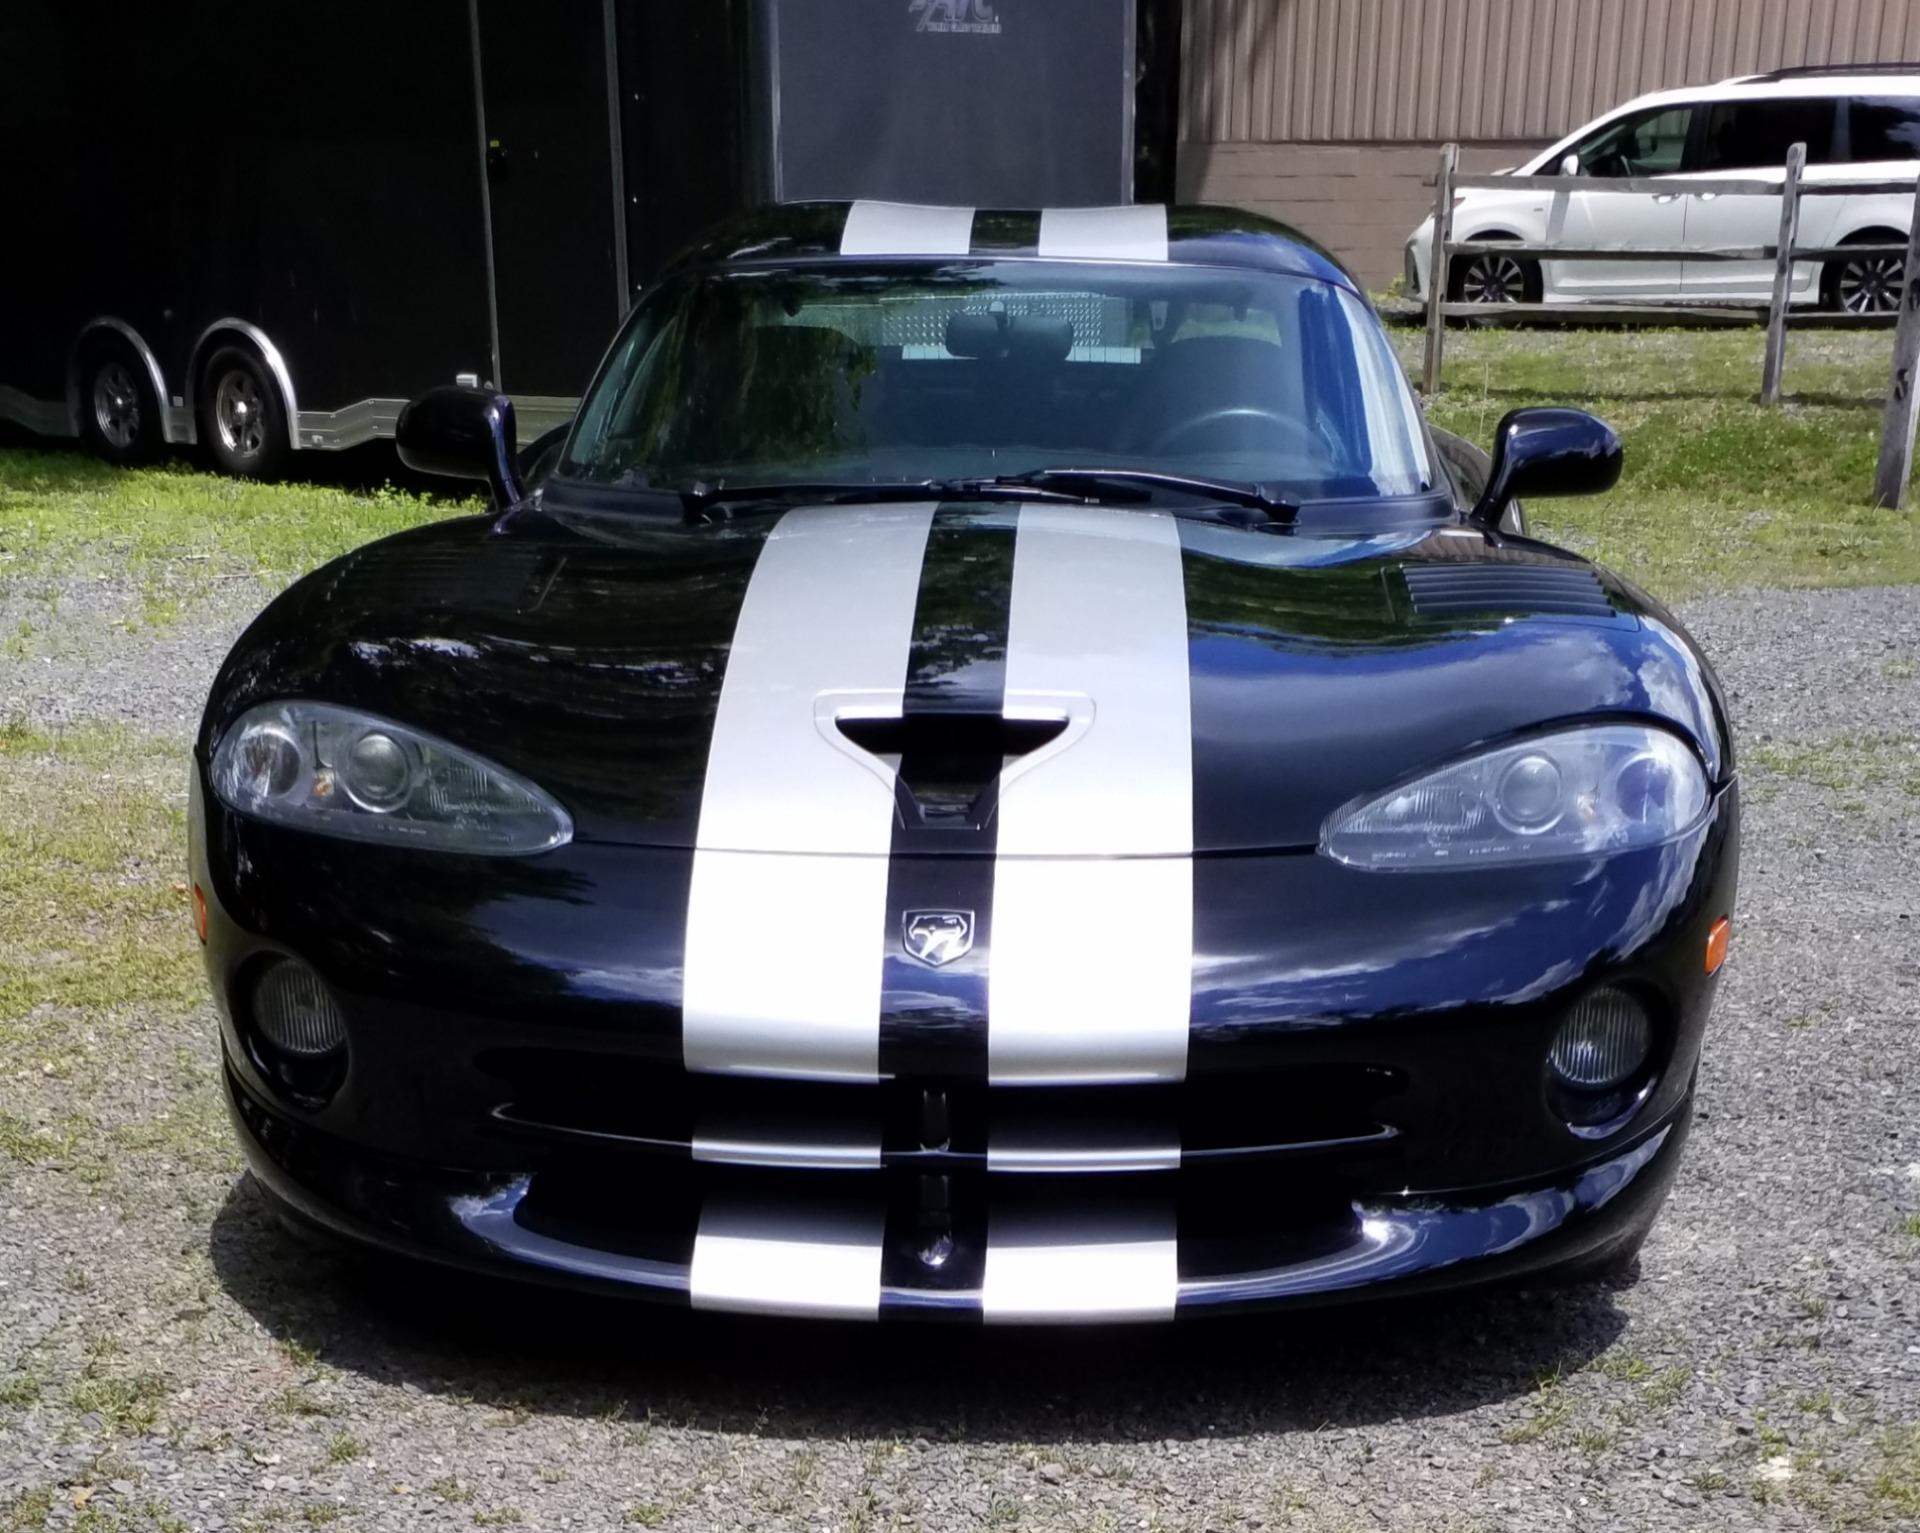 Used-1999-Dodge-Viper--GTS